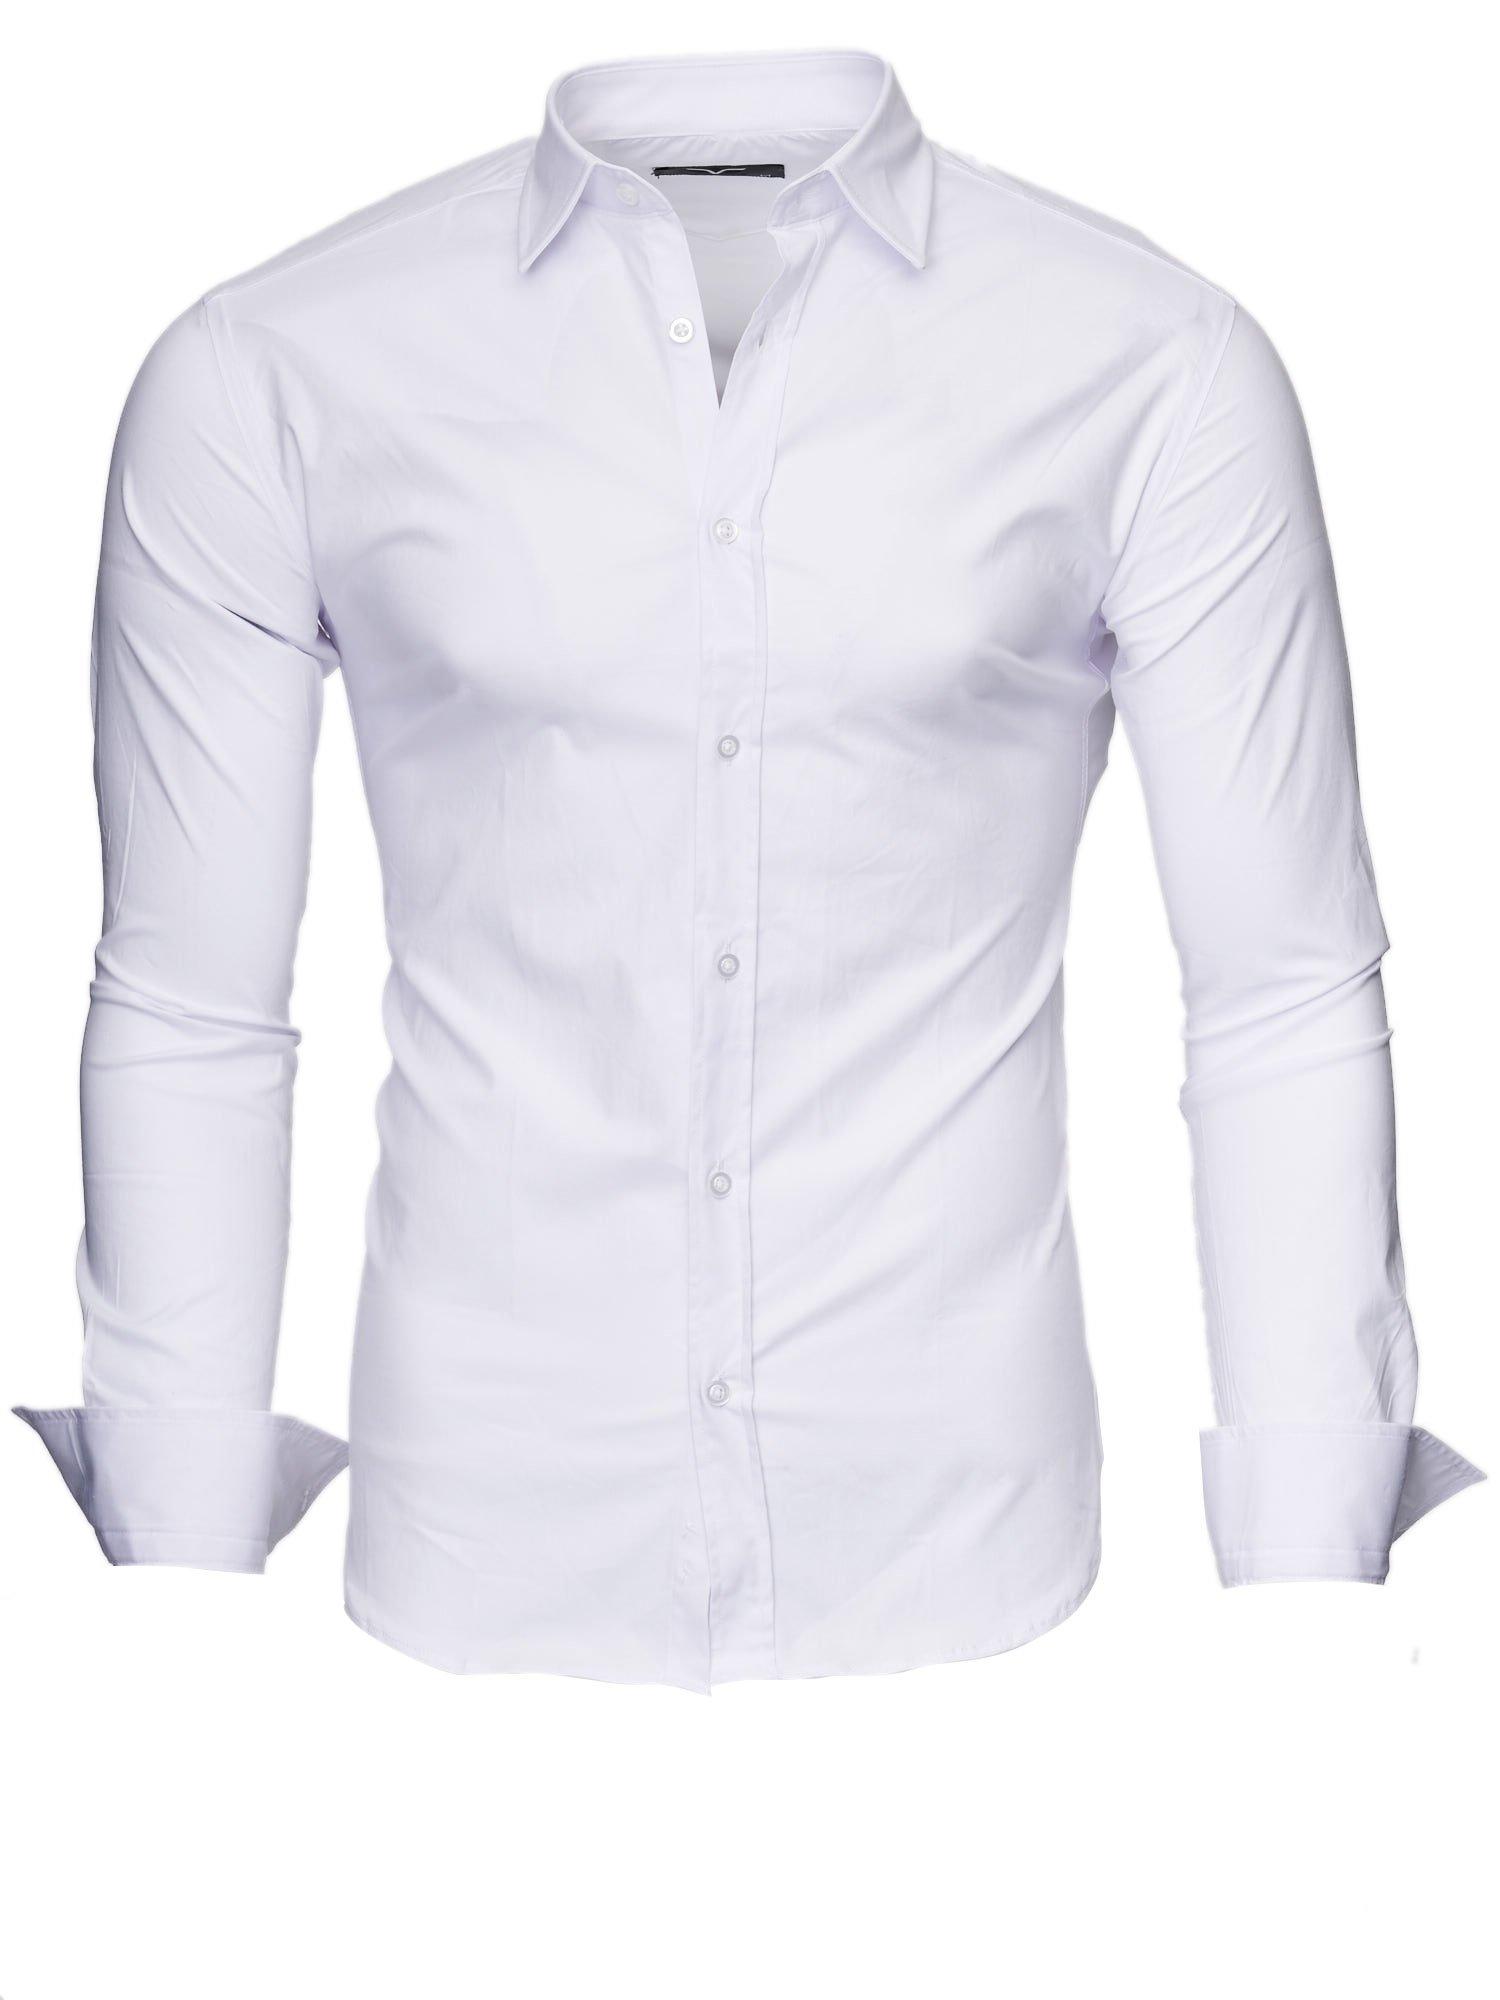 Kayhan Camisas Hombres Camisa Hombre Manga Larga Ropa Camisas de Vestir Slim fácil de Hierro Fit S M L XL XXL-6X – Uni